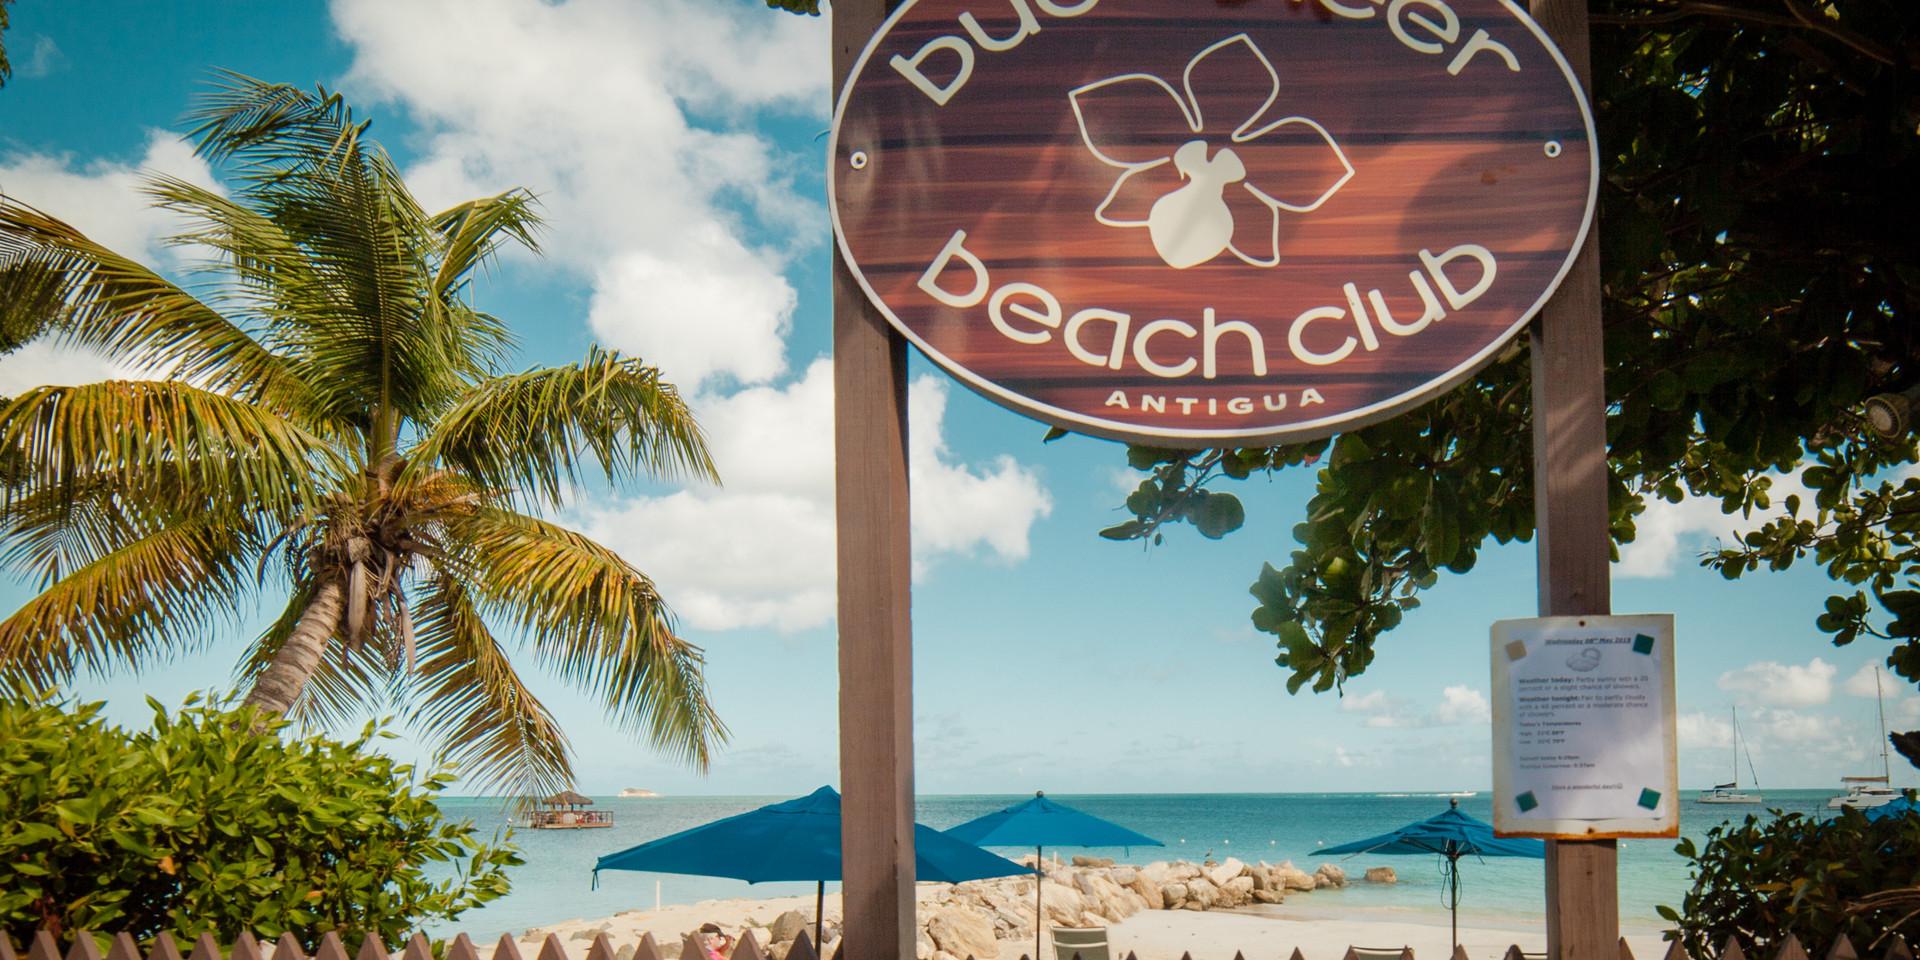 20190508-Buccaneer Beach Club photoshoot